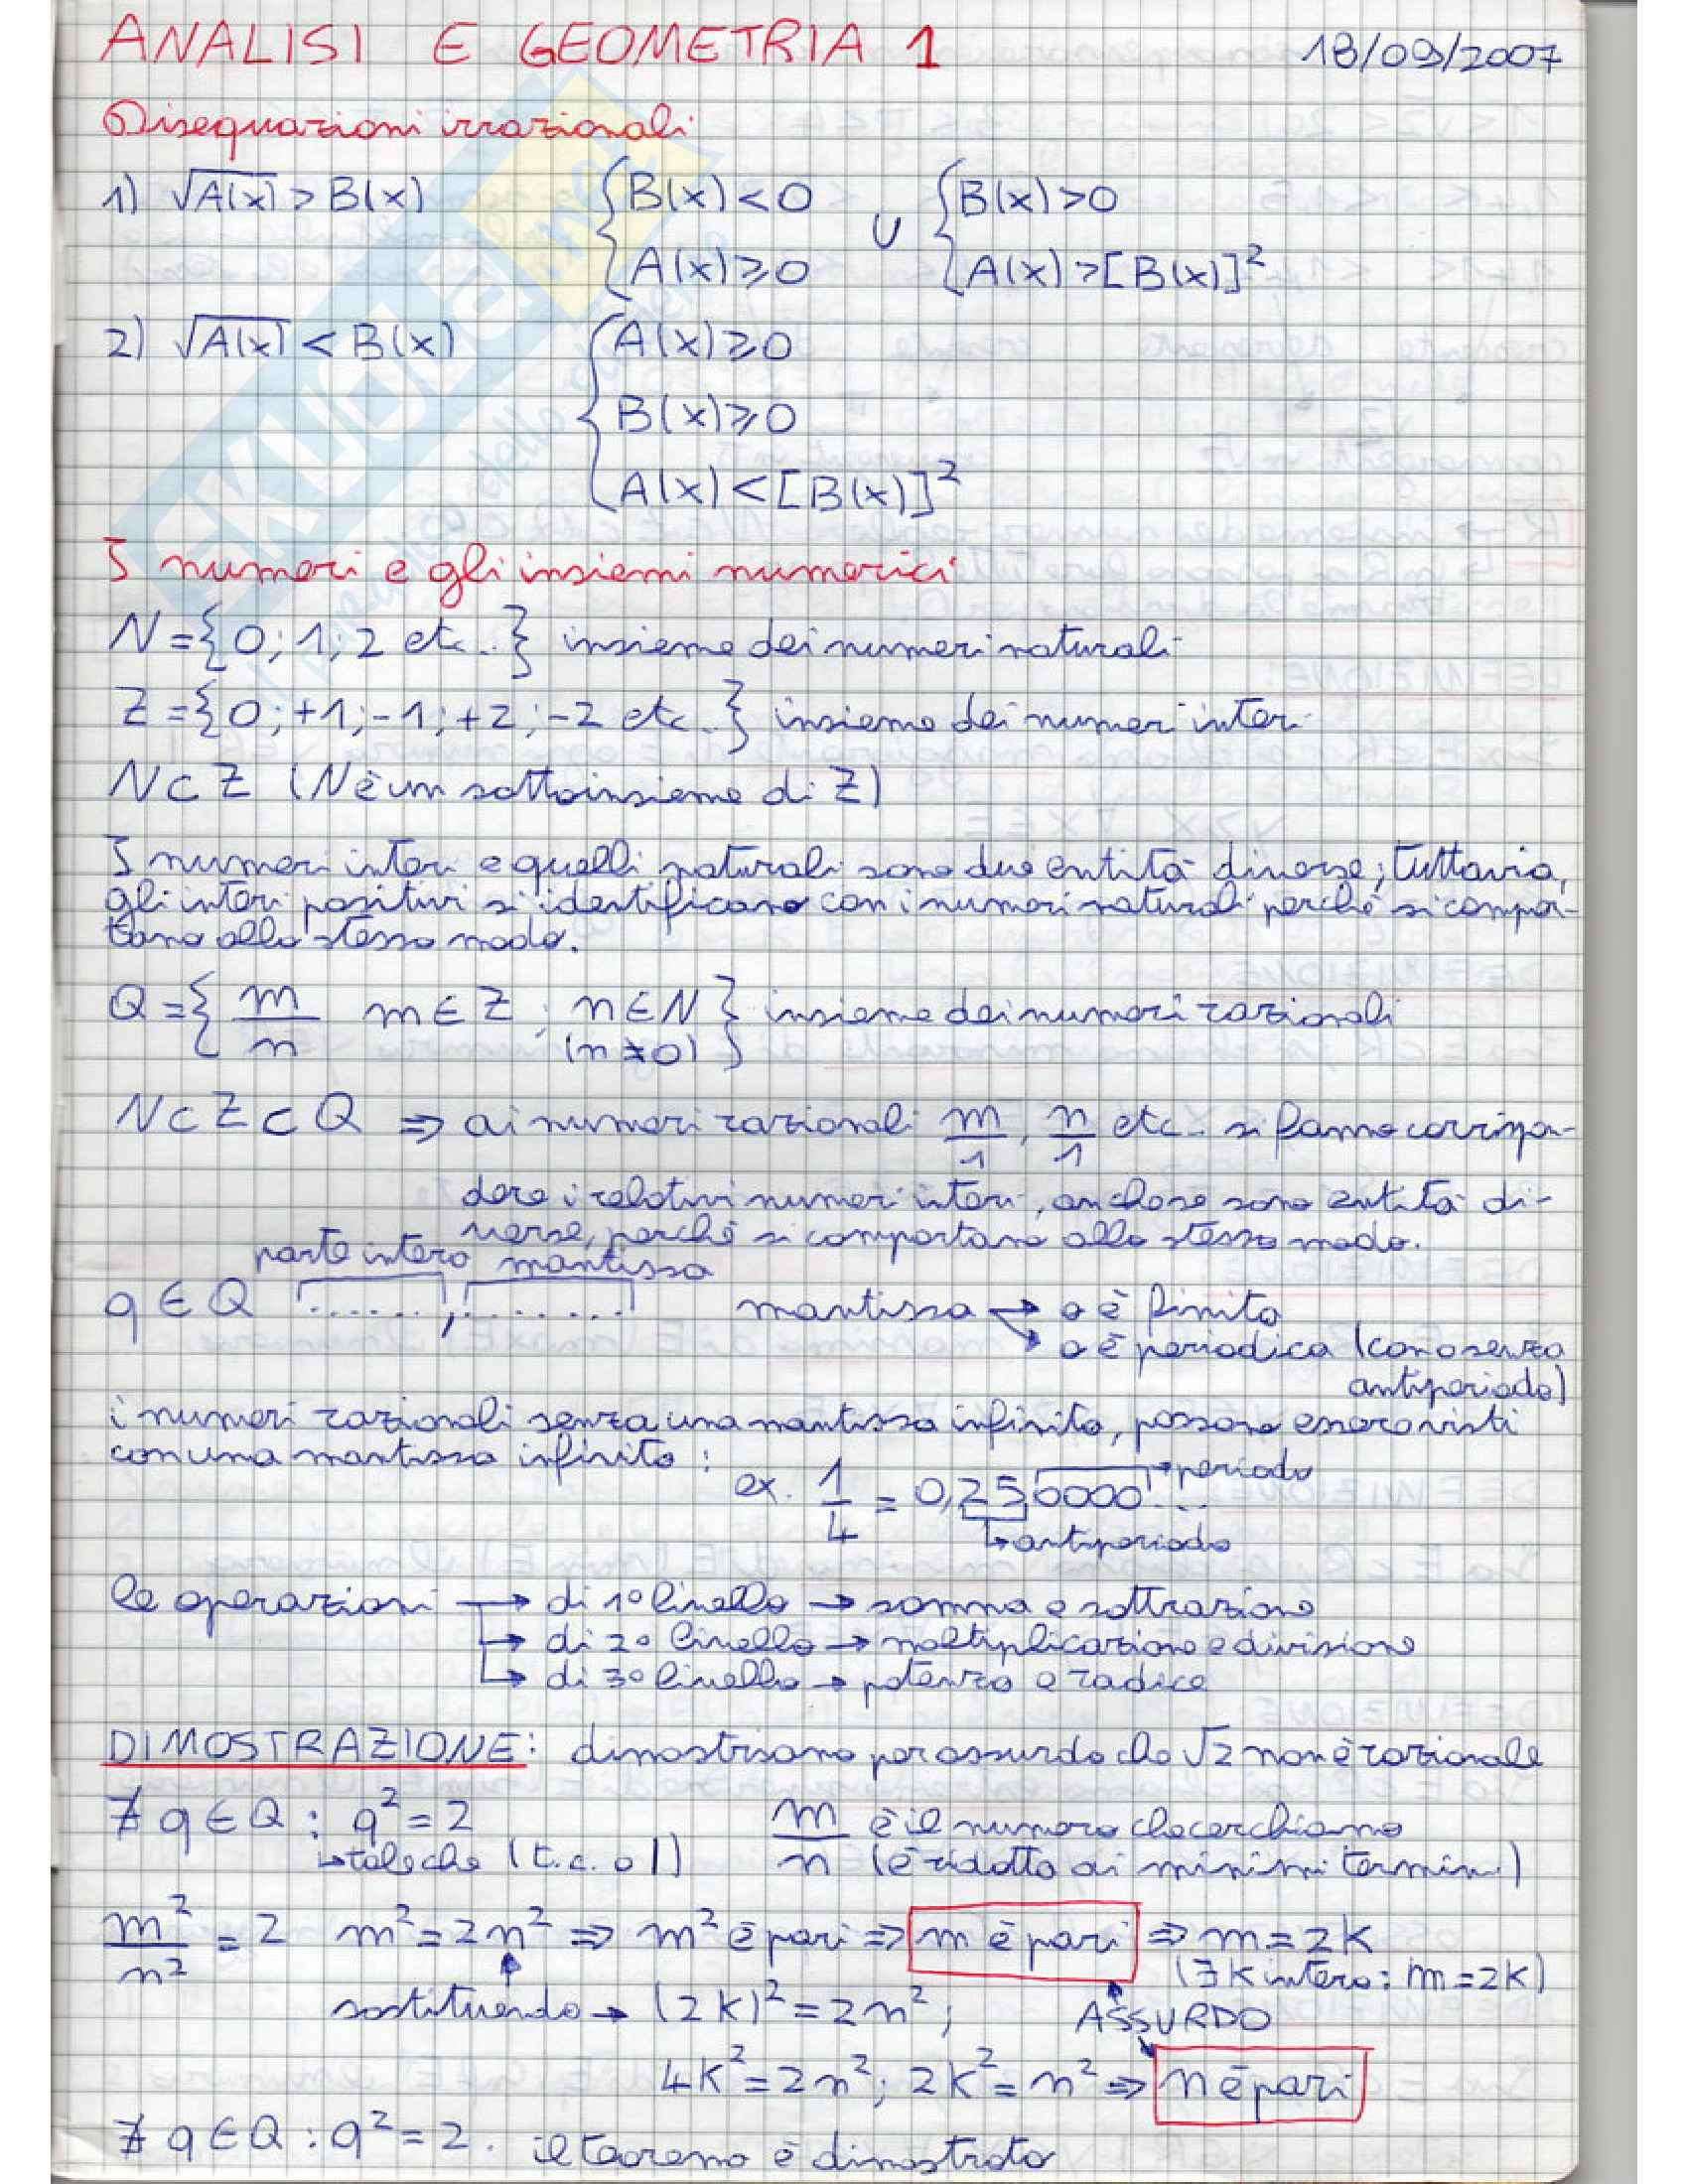 Analisi e geometria 1 - appunti